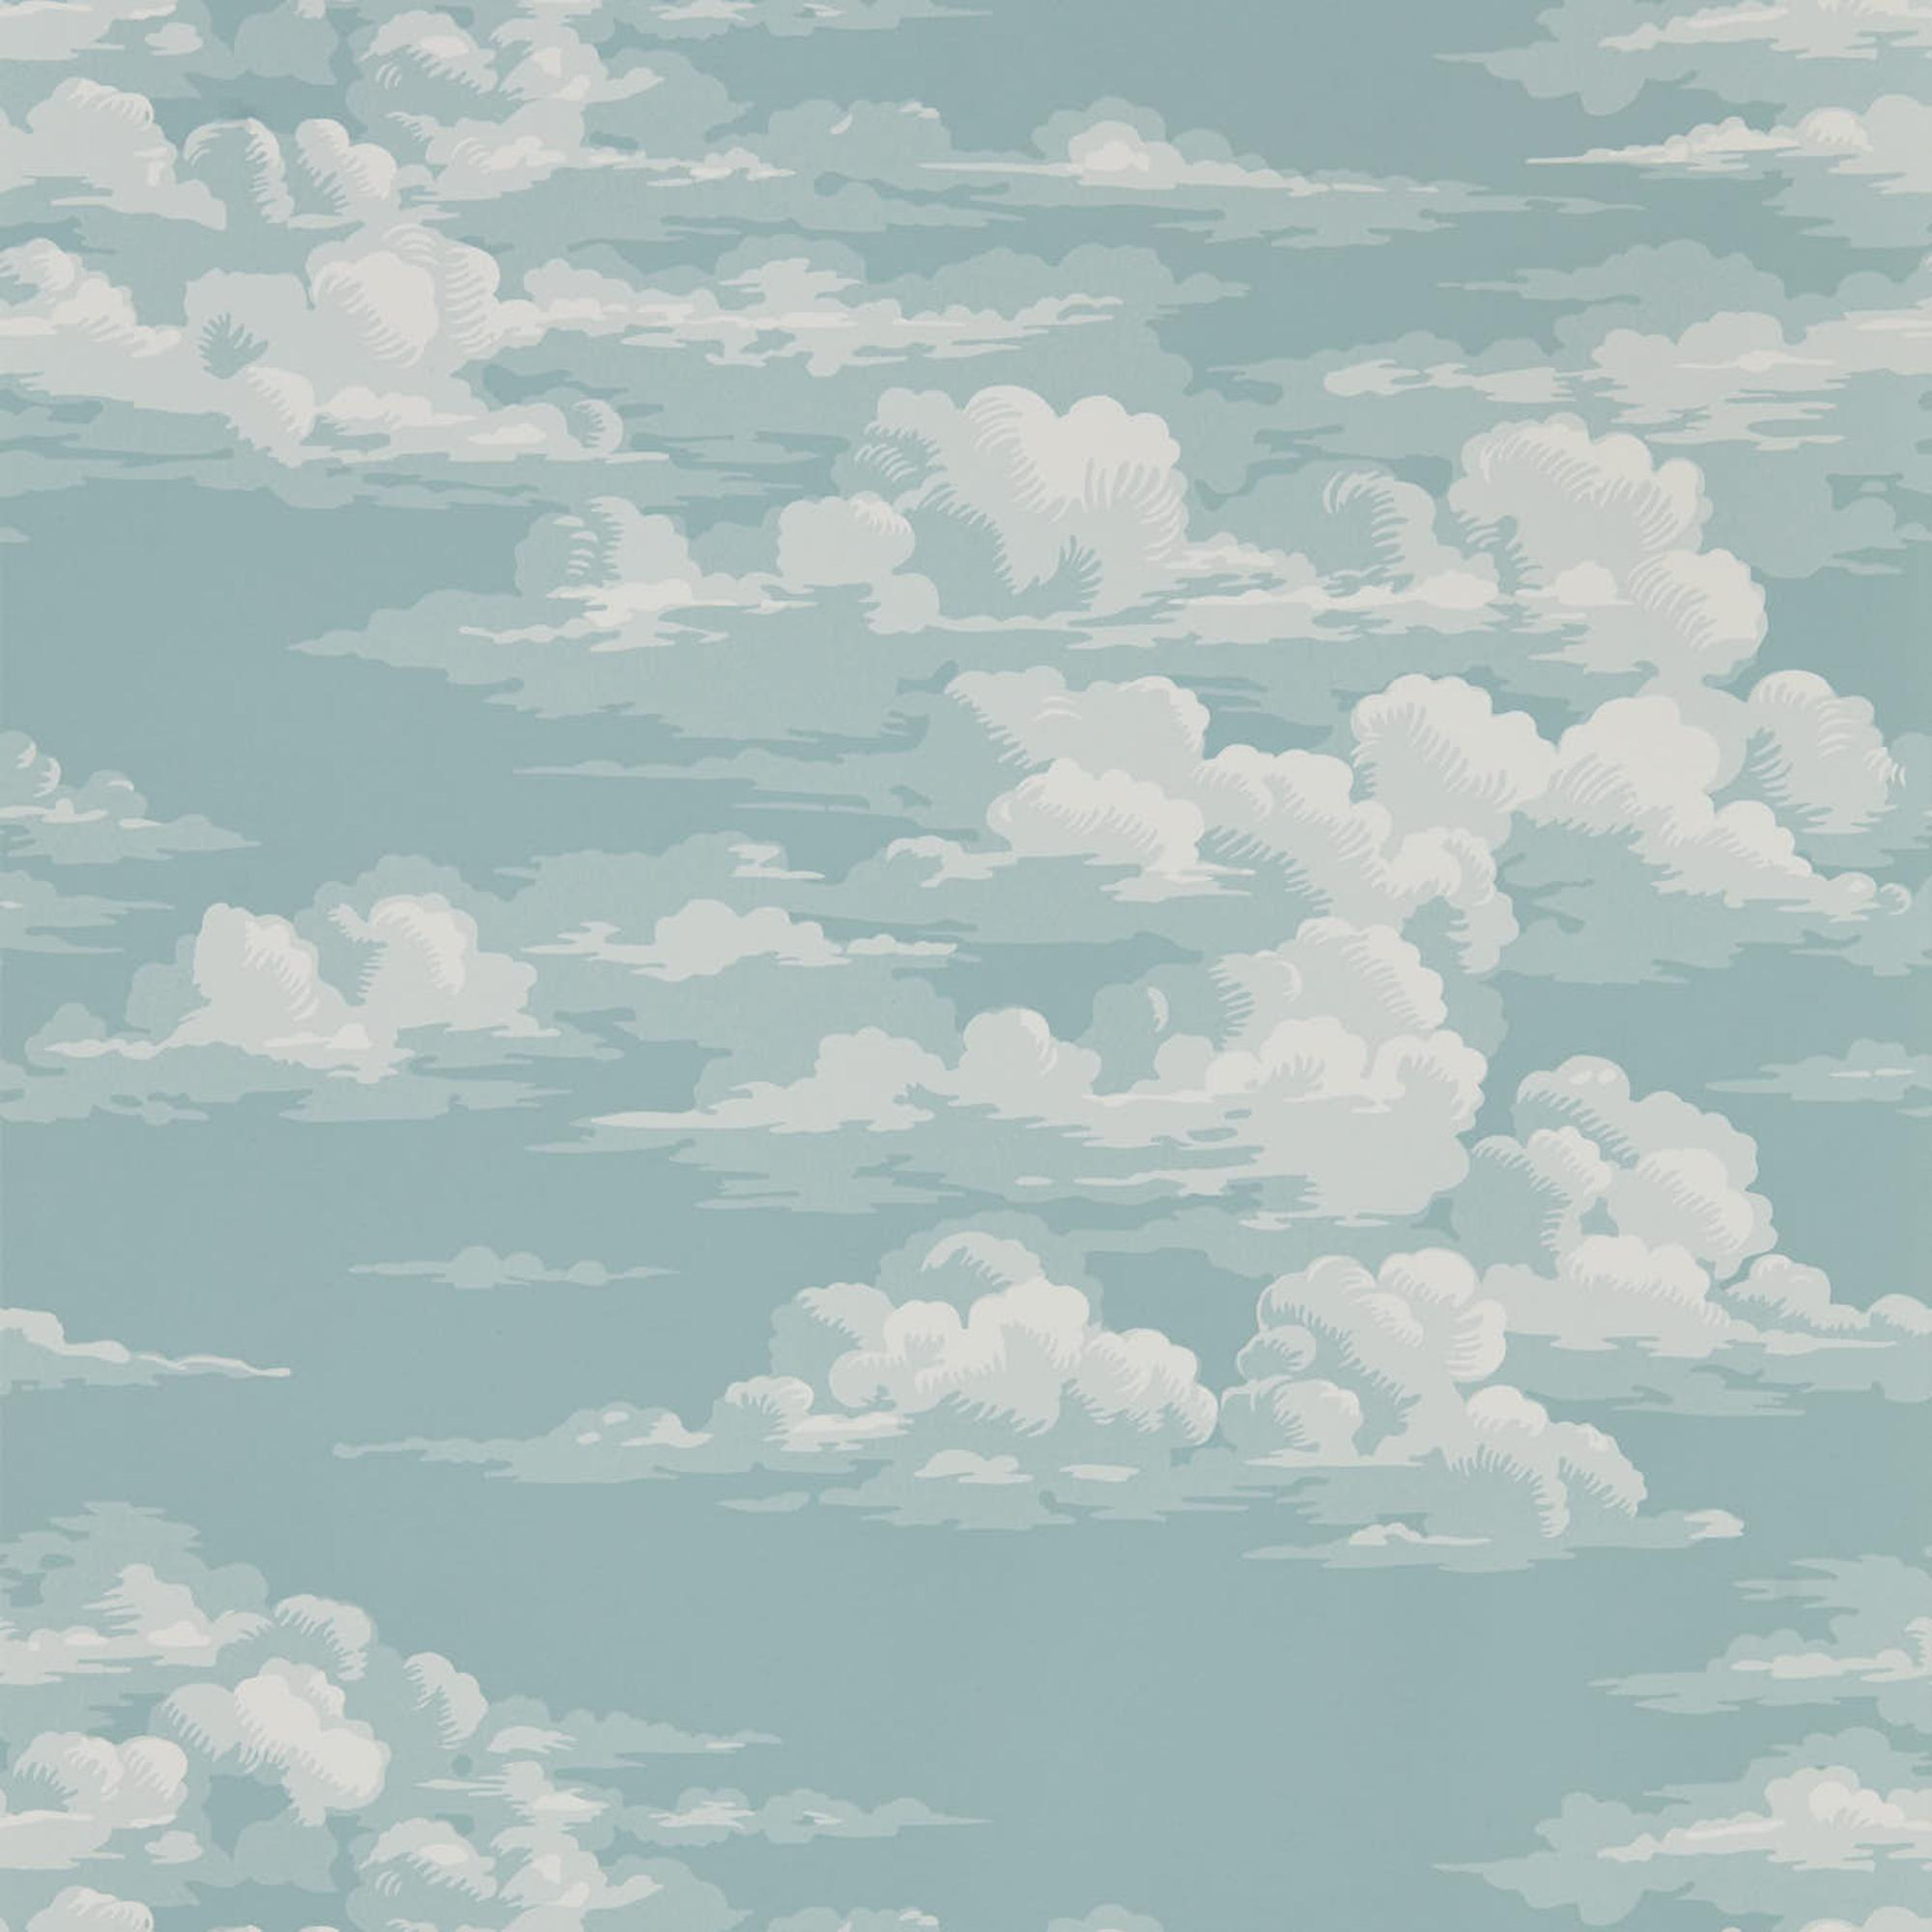 HD Cloud Wallpaper